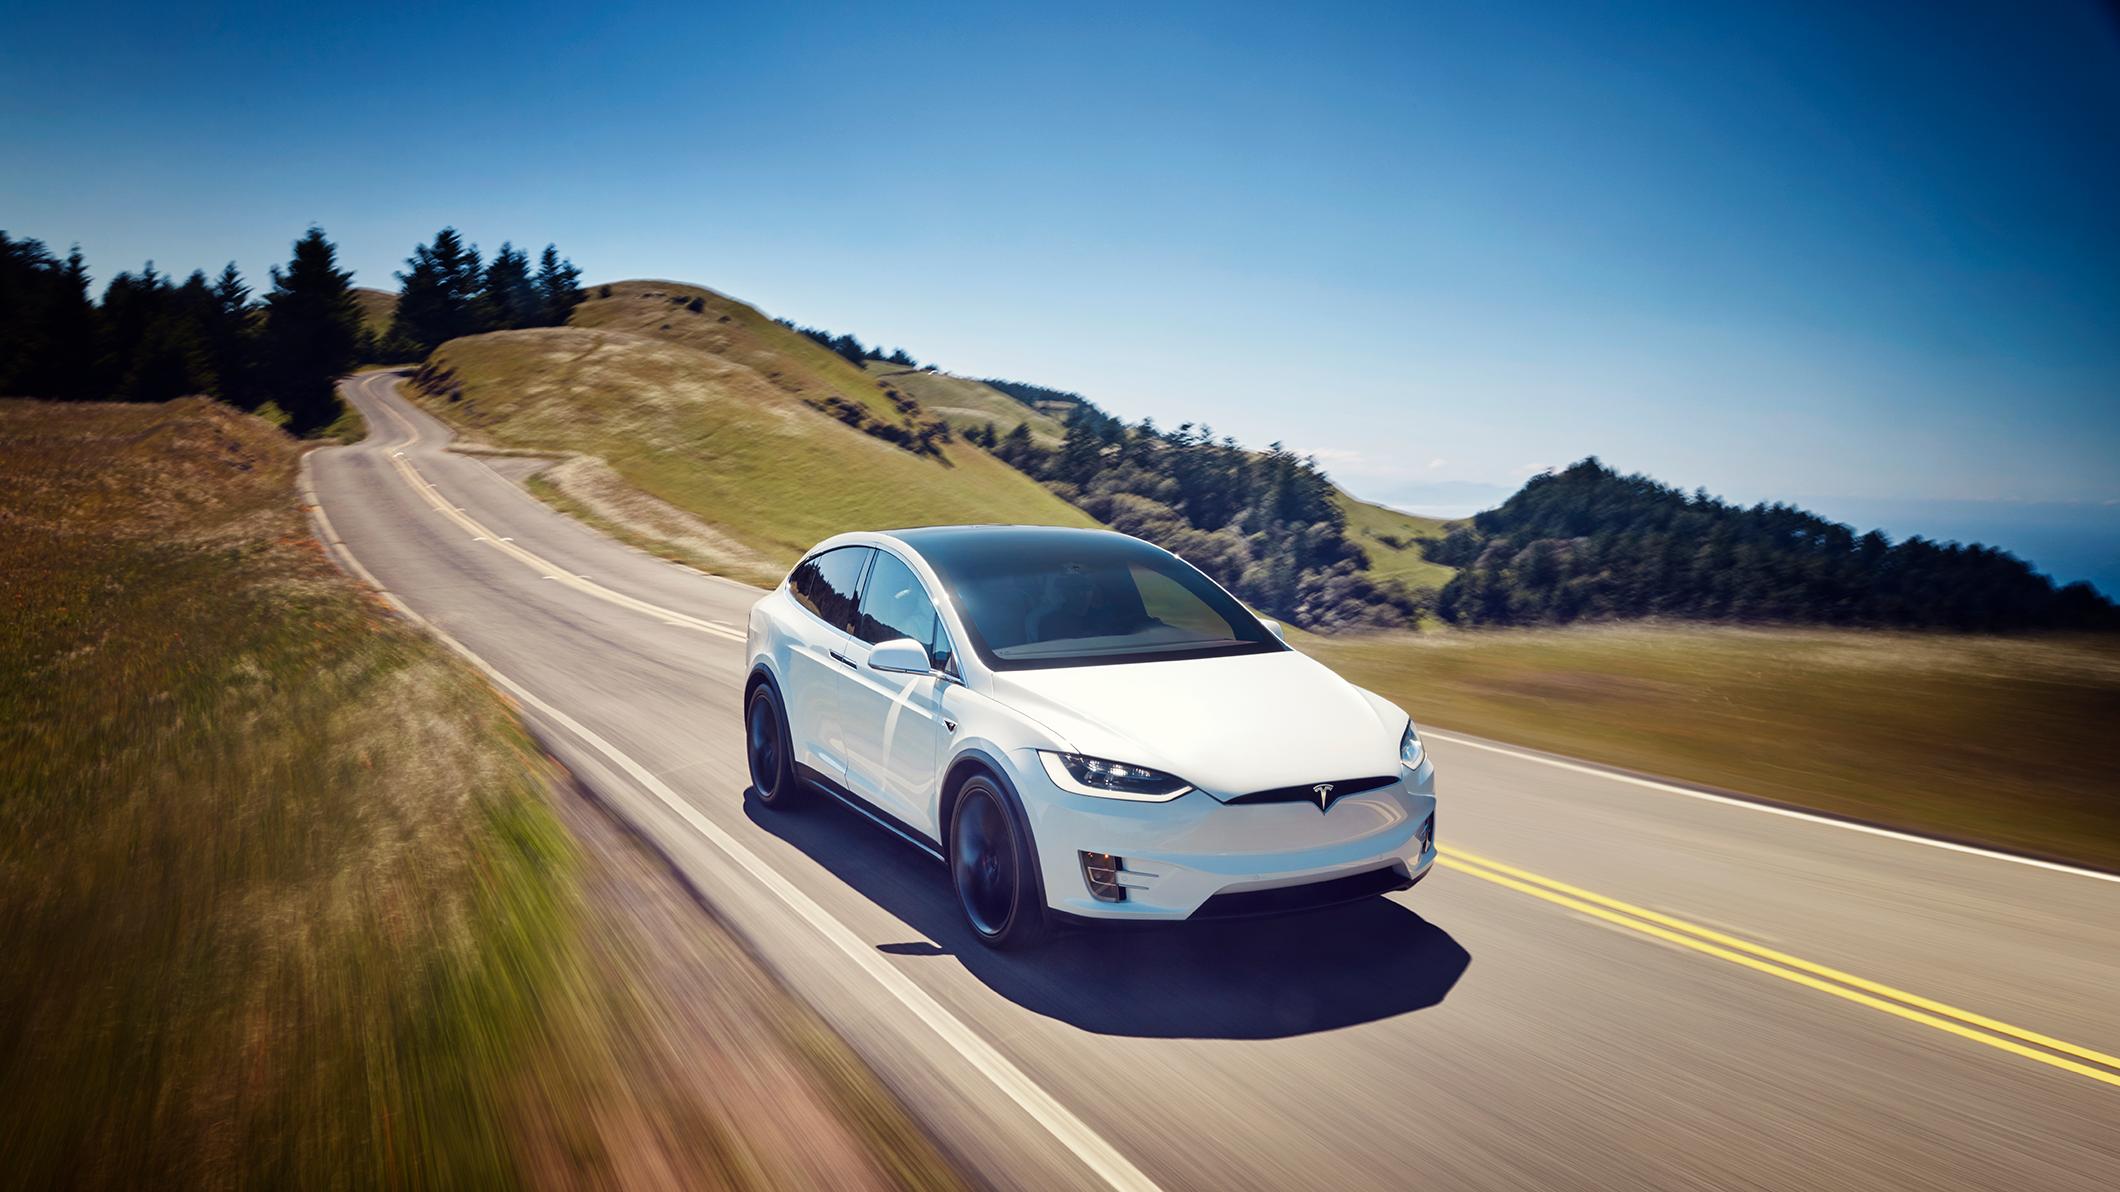 A Tesla Model X driving downhill.